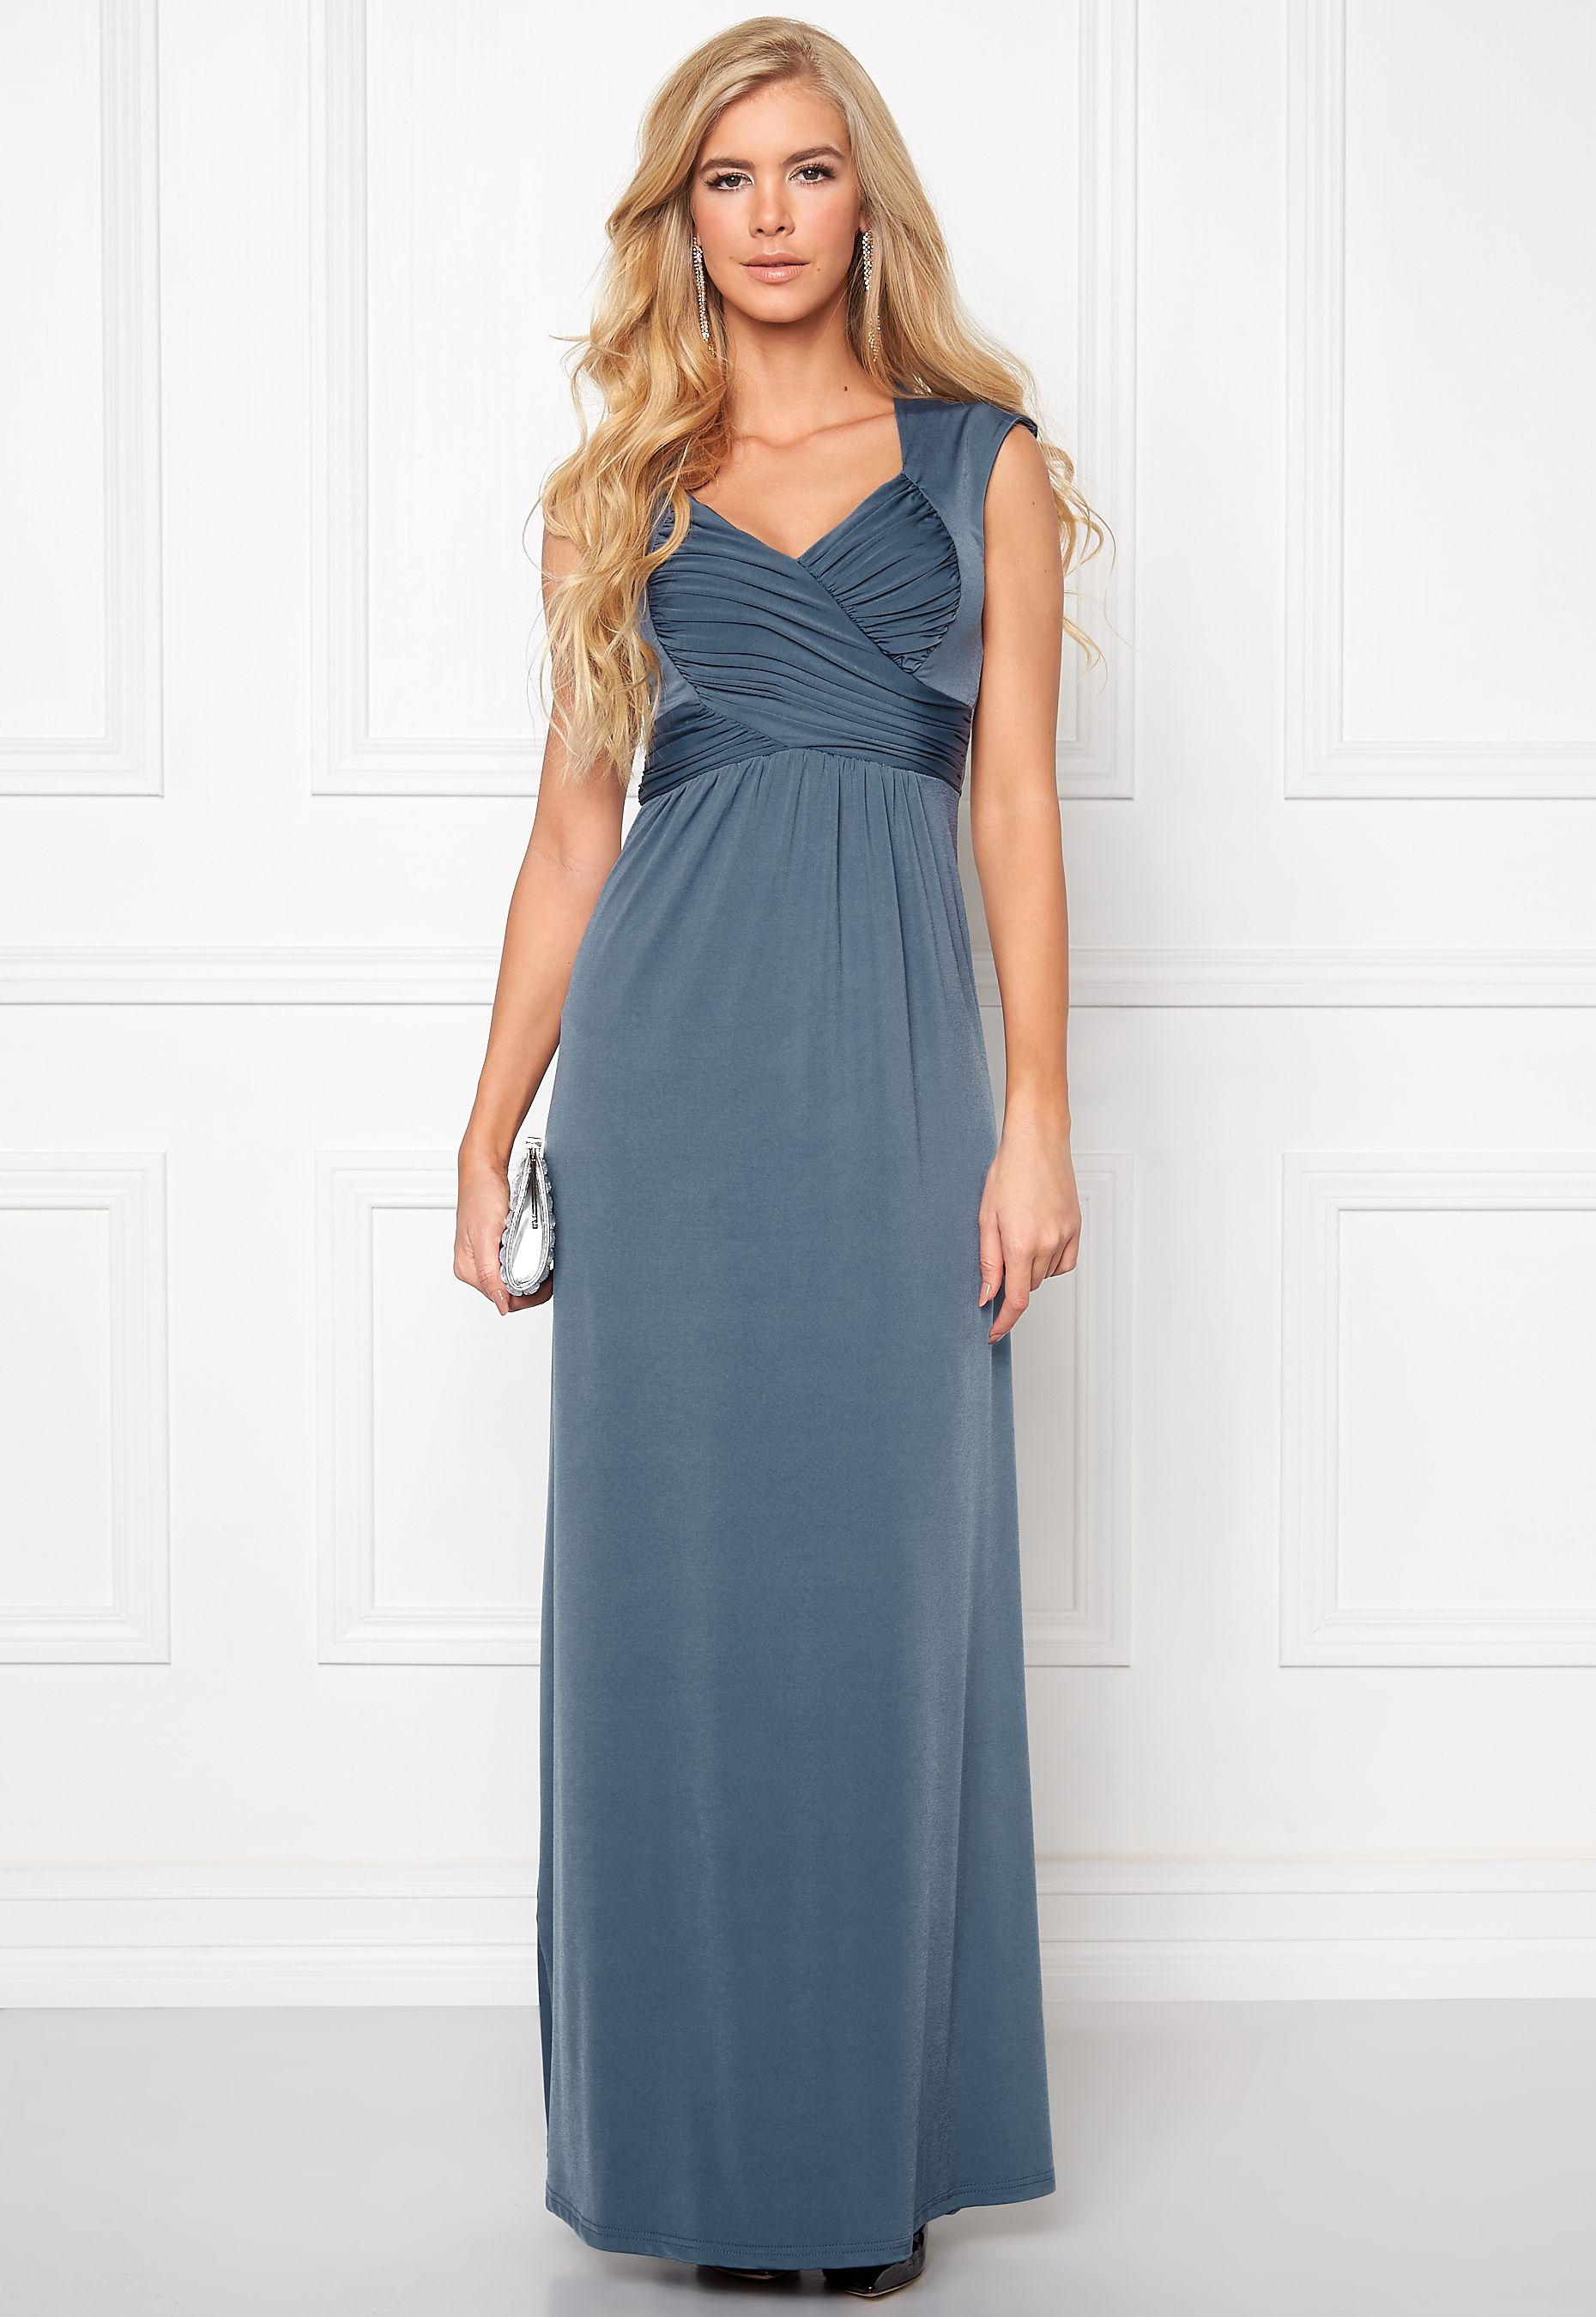 19c0db4c9c9 Chiara Forthi Francine Dress Pigeon Blue - Bubbleroom   Kjoler ...